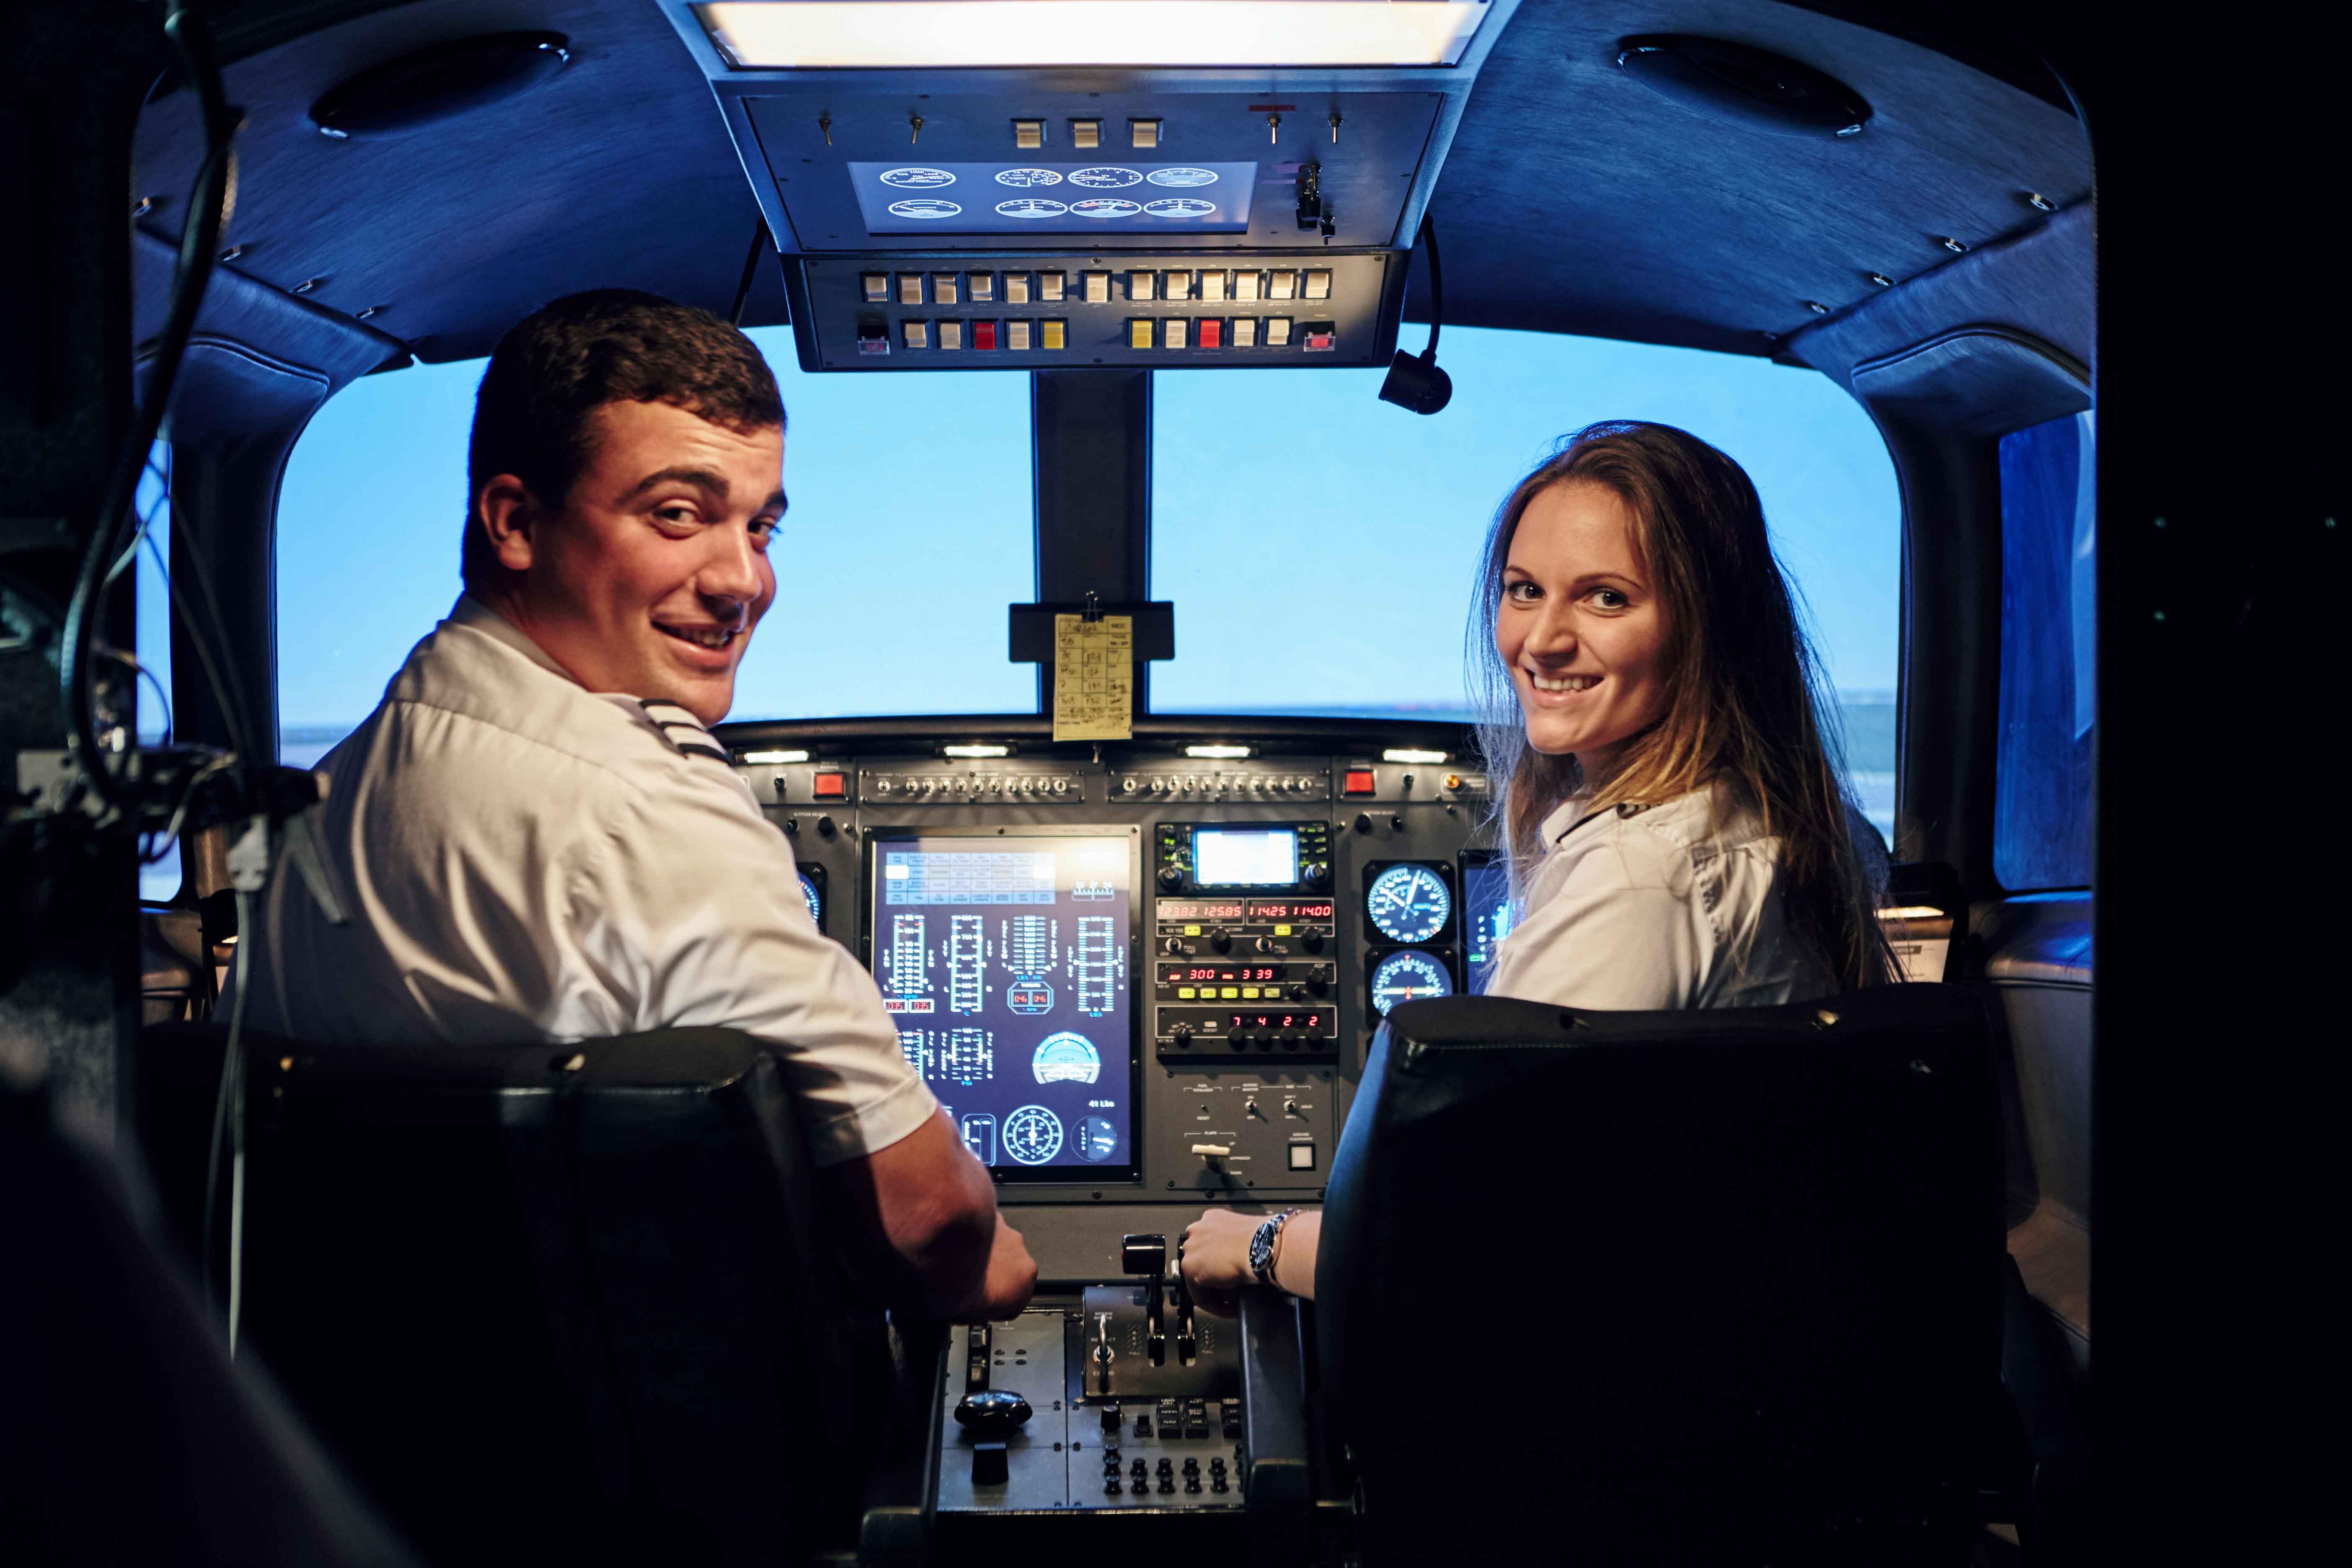 Paulina-female-pilot-aviatrix.jpg